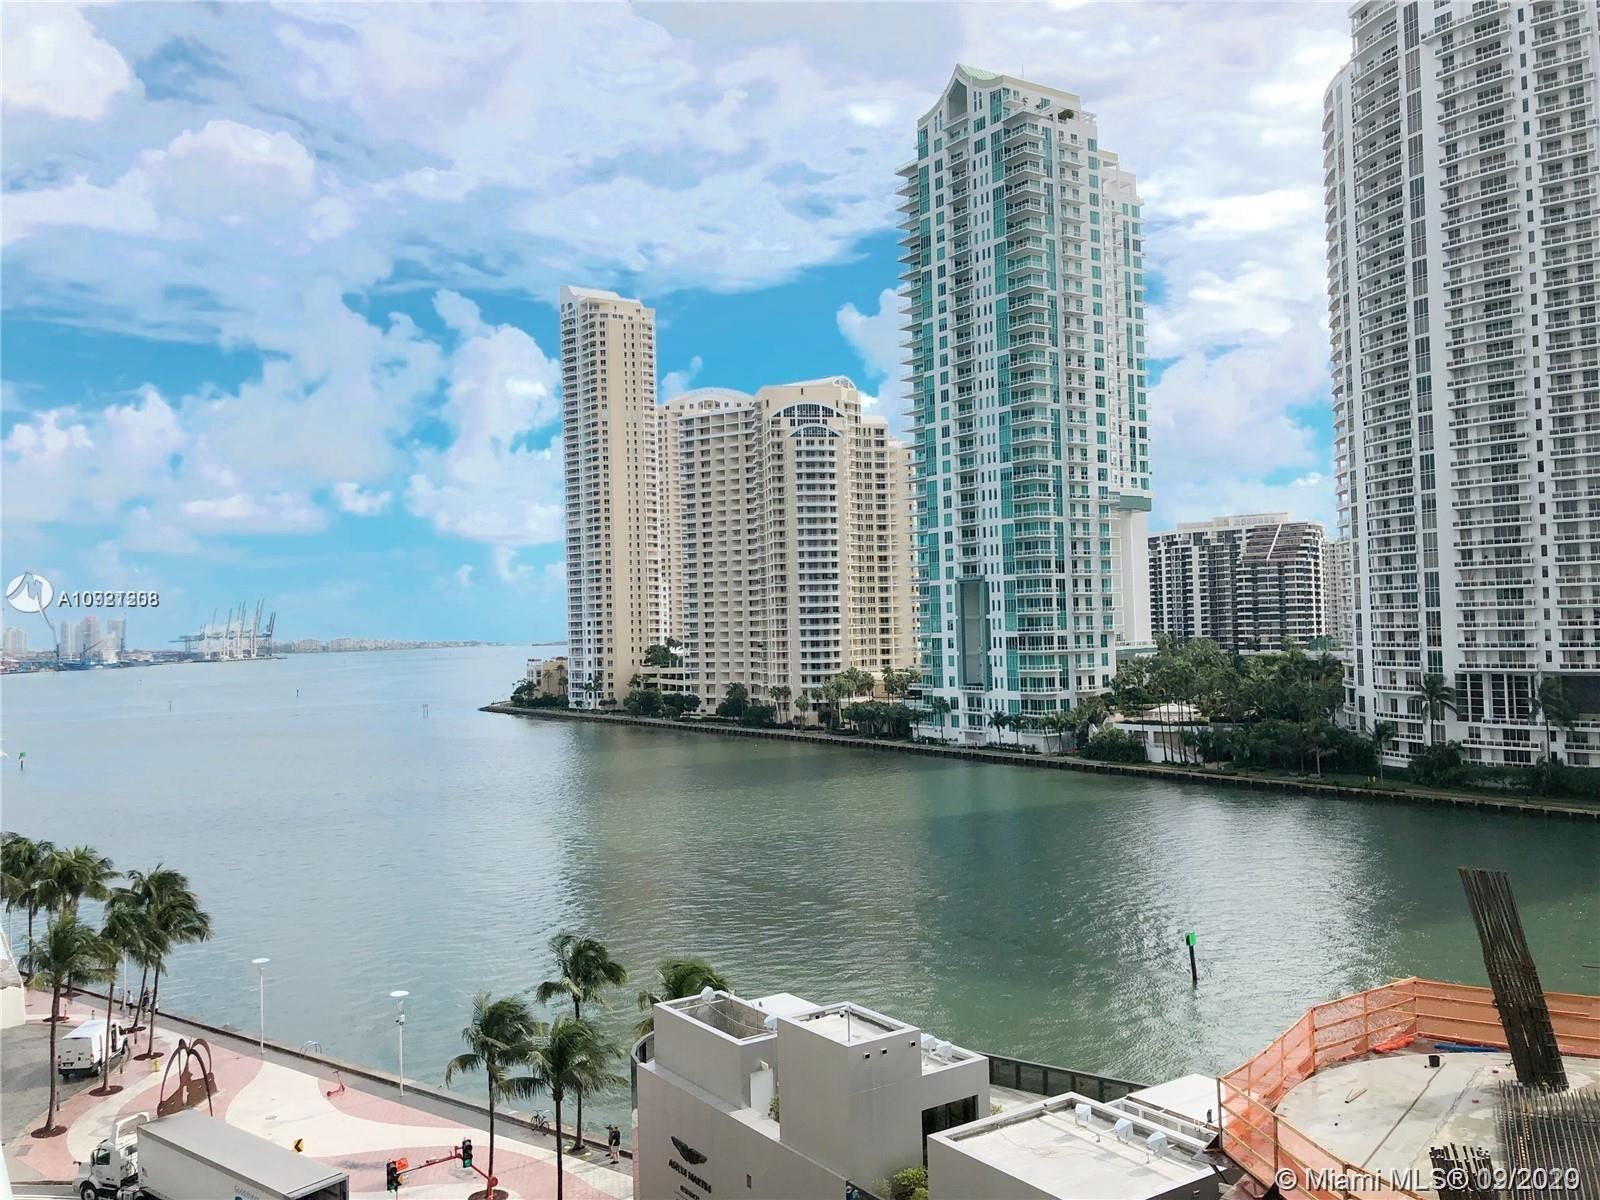 300 S Biscayne Blvd #L-802, Miami, FL 33131 - #: A10921208